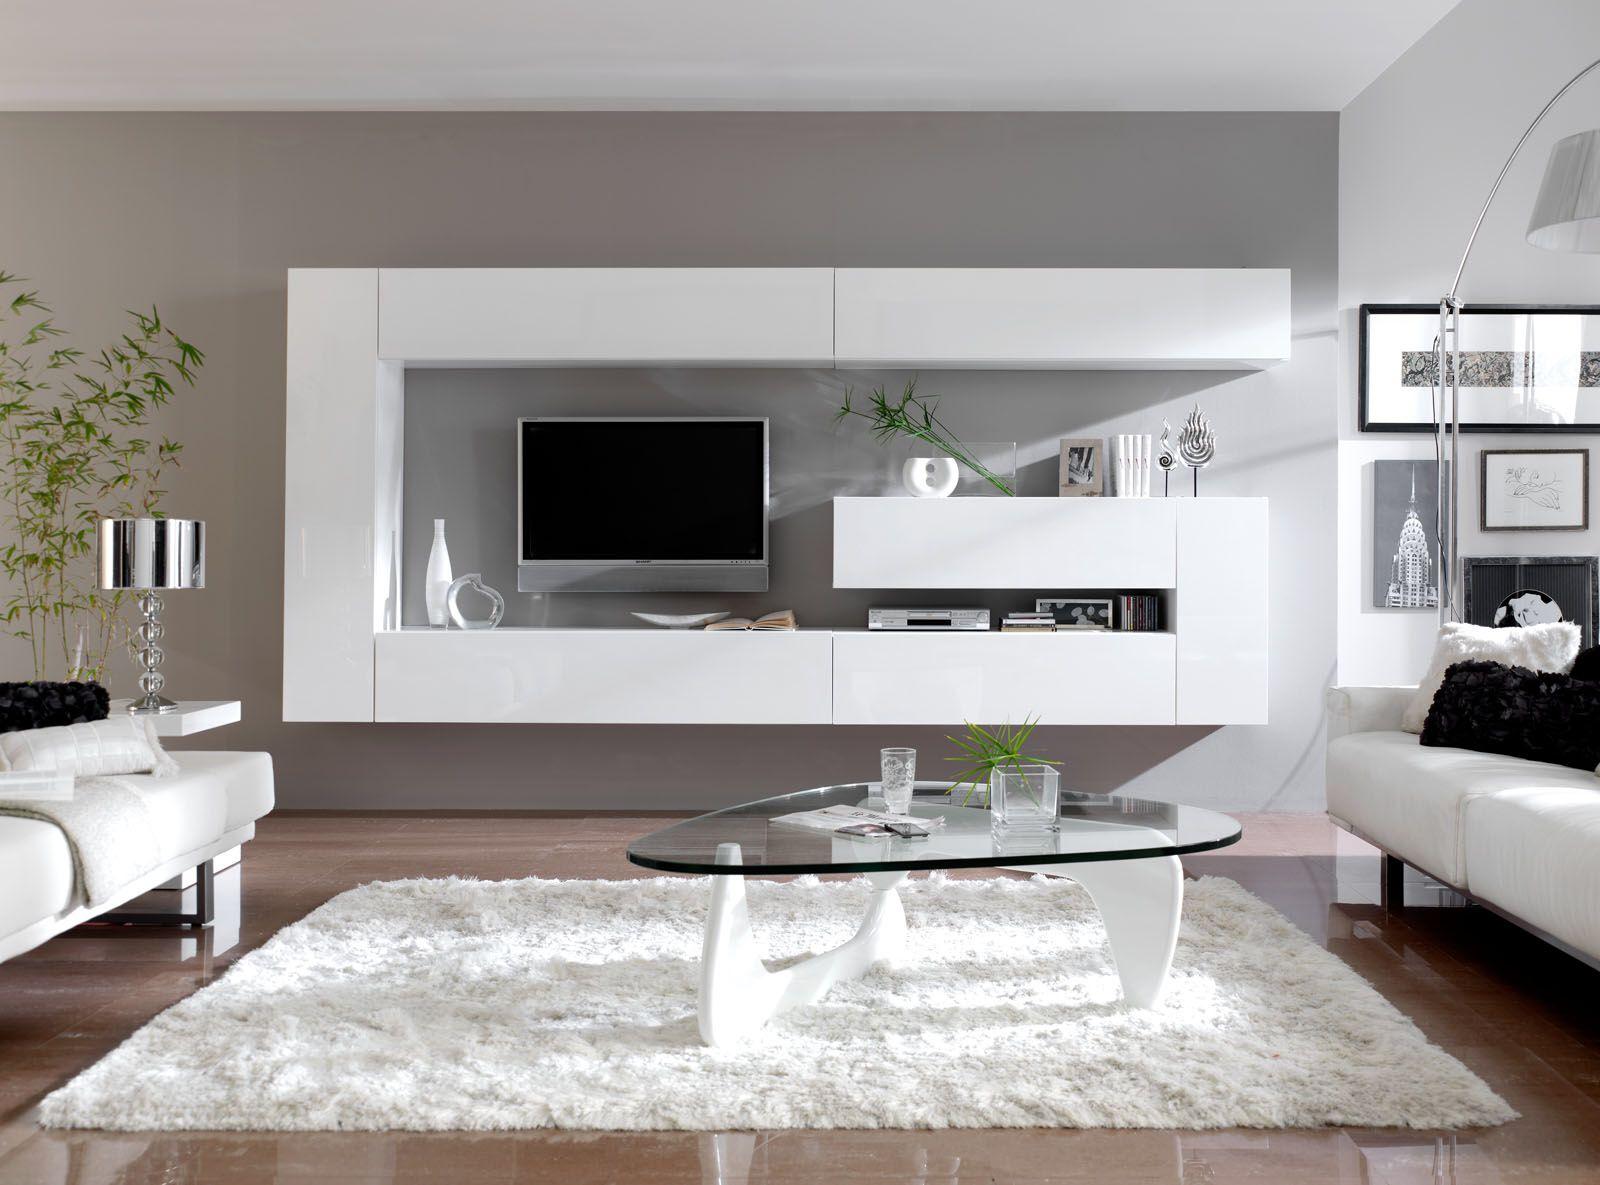 Modular Bedroom Furniture Systems Salong Modul Wwwmirameno Modul Hylle Stue Design Interior